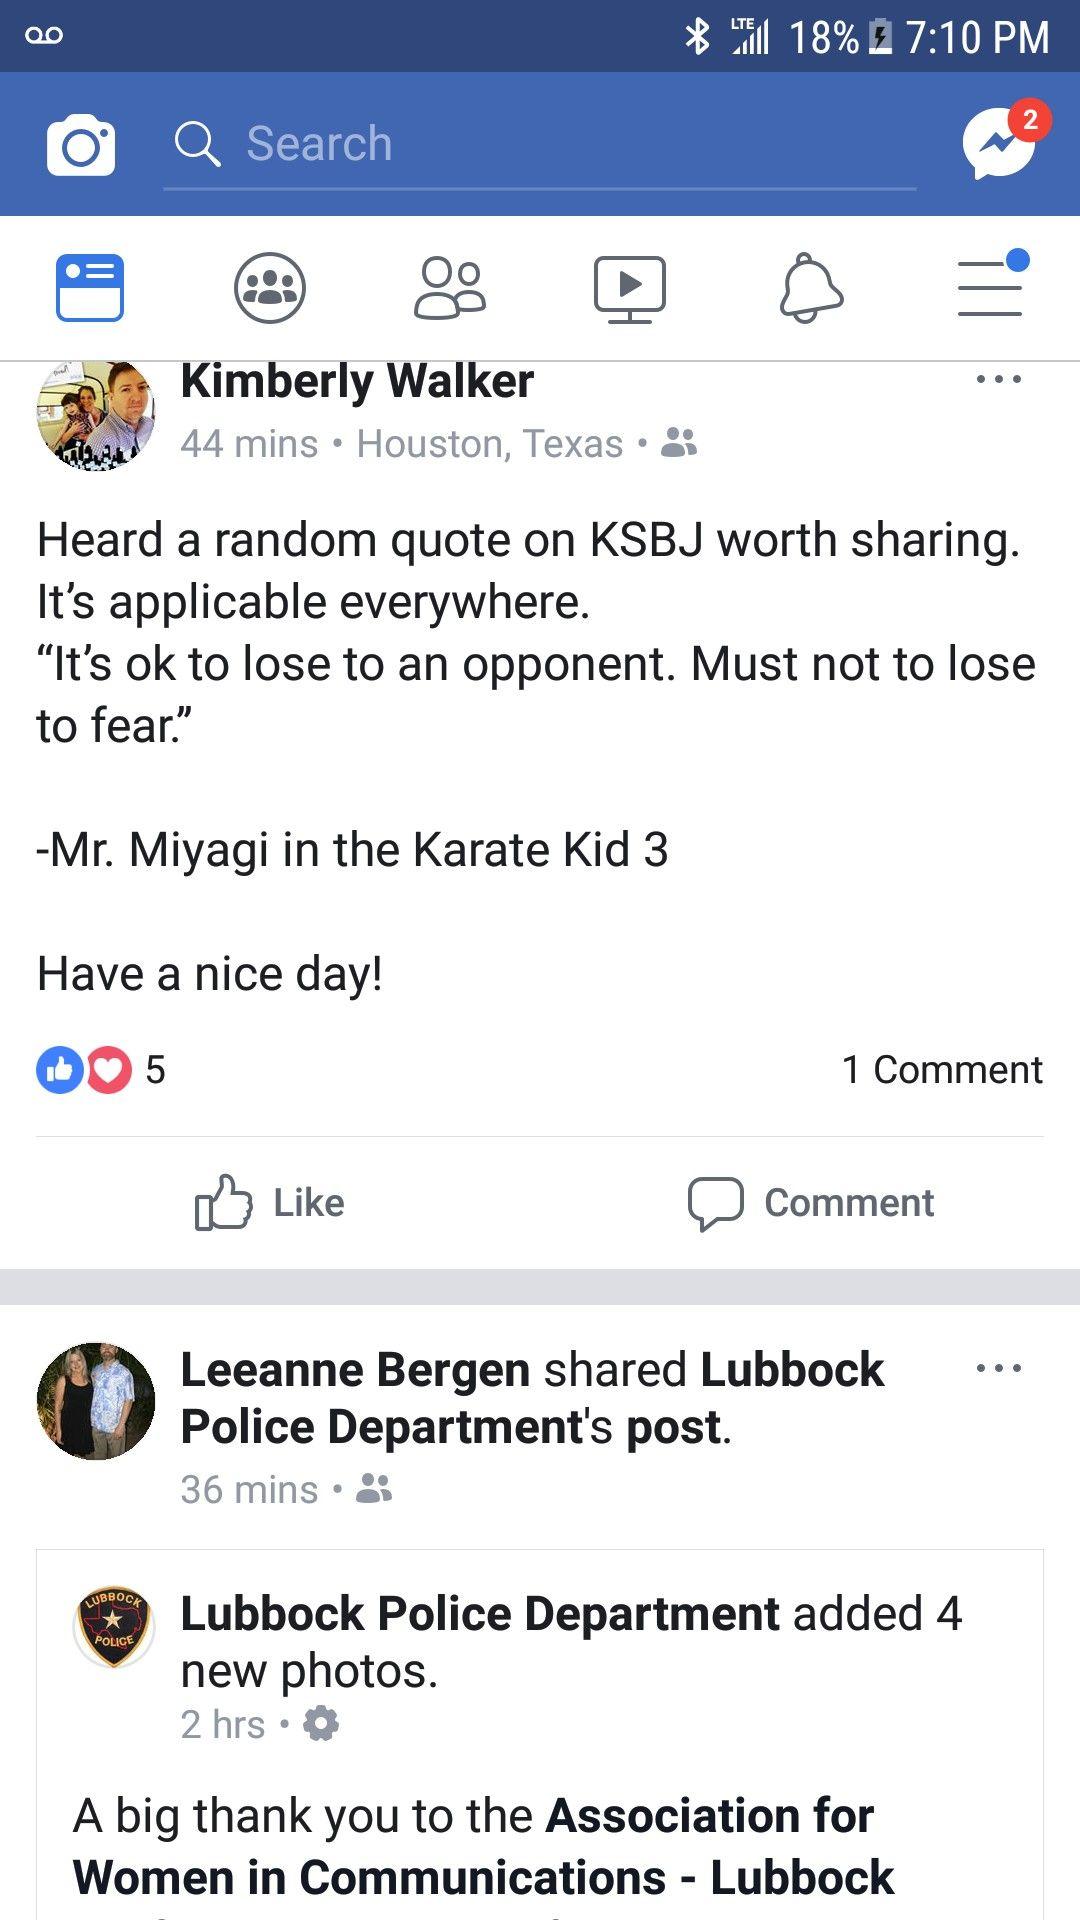 Pin by Melissa Huse on Signs Karate kid 3, Karate, Its ok